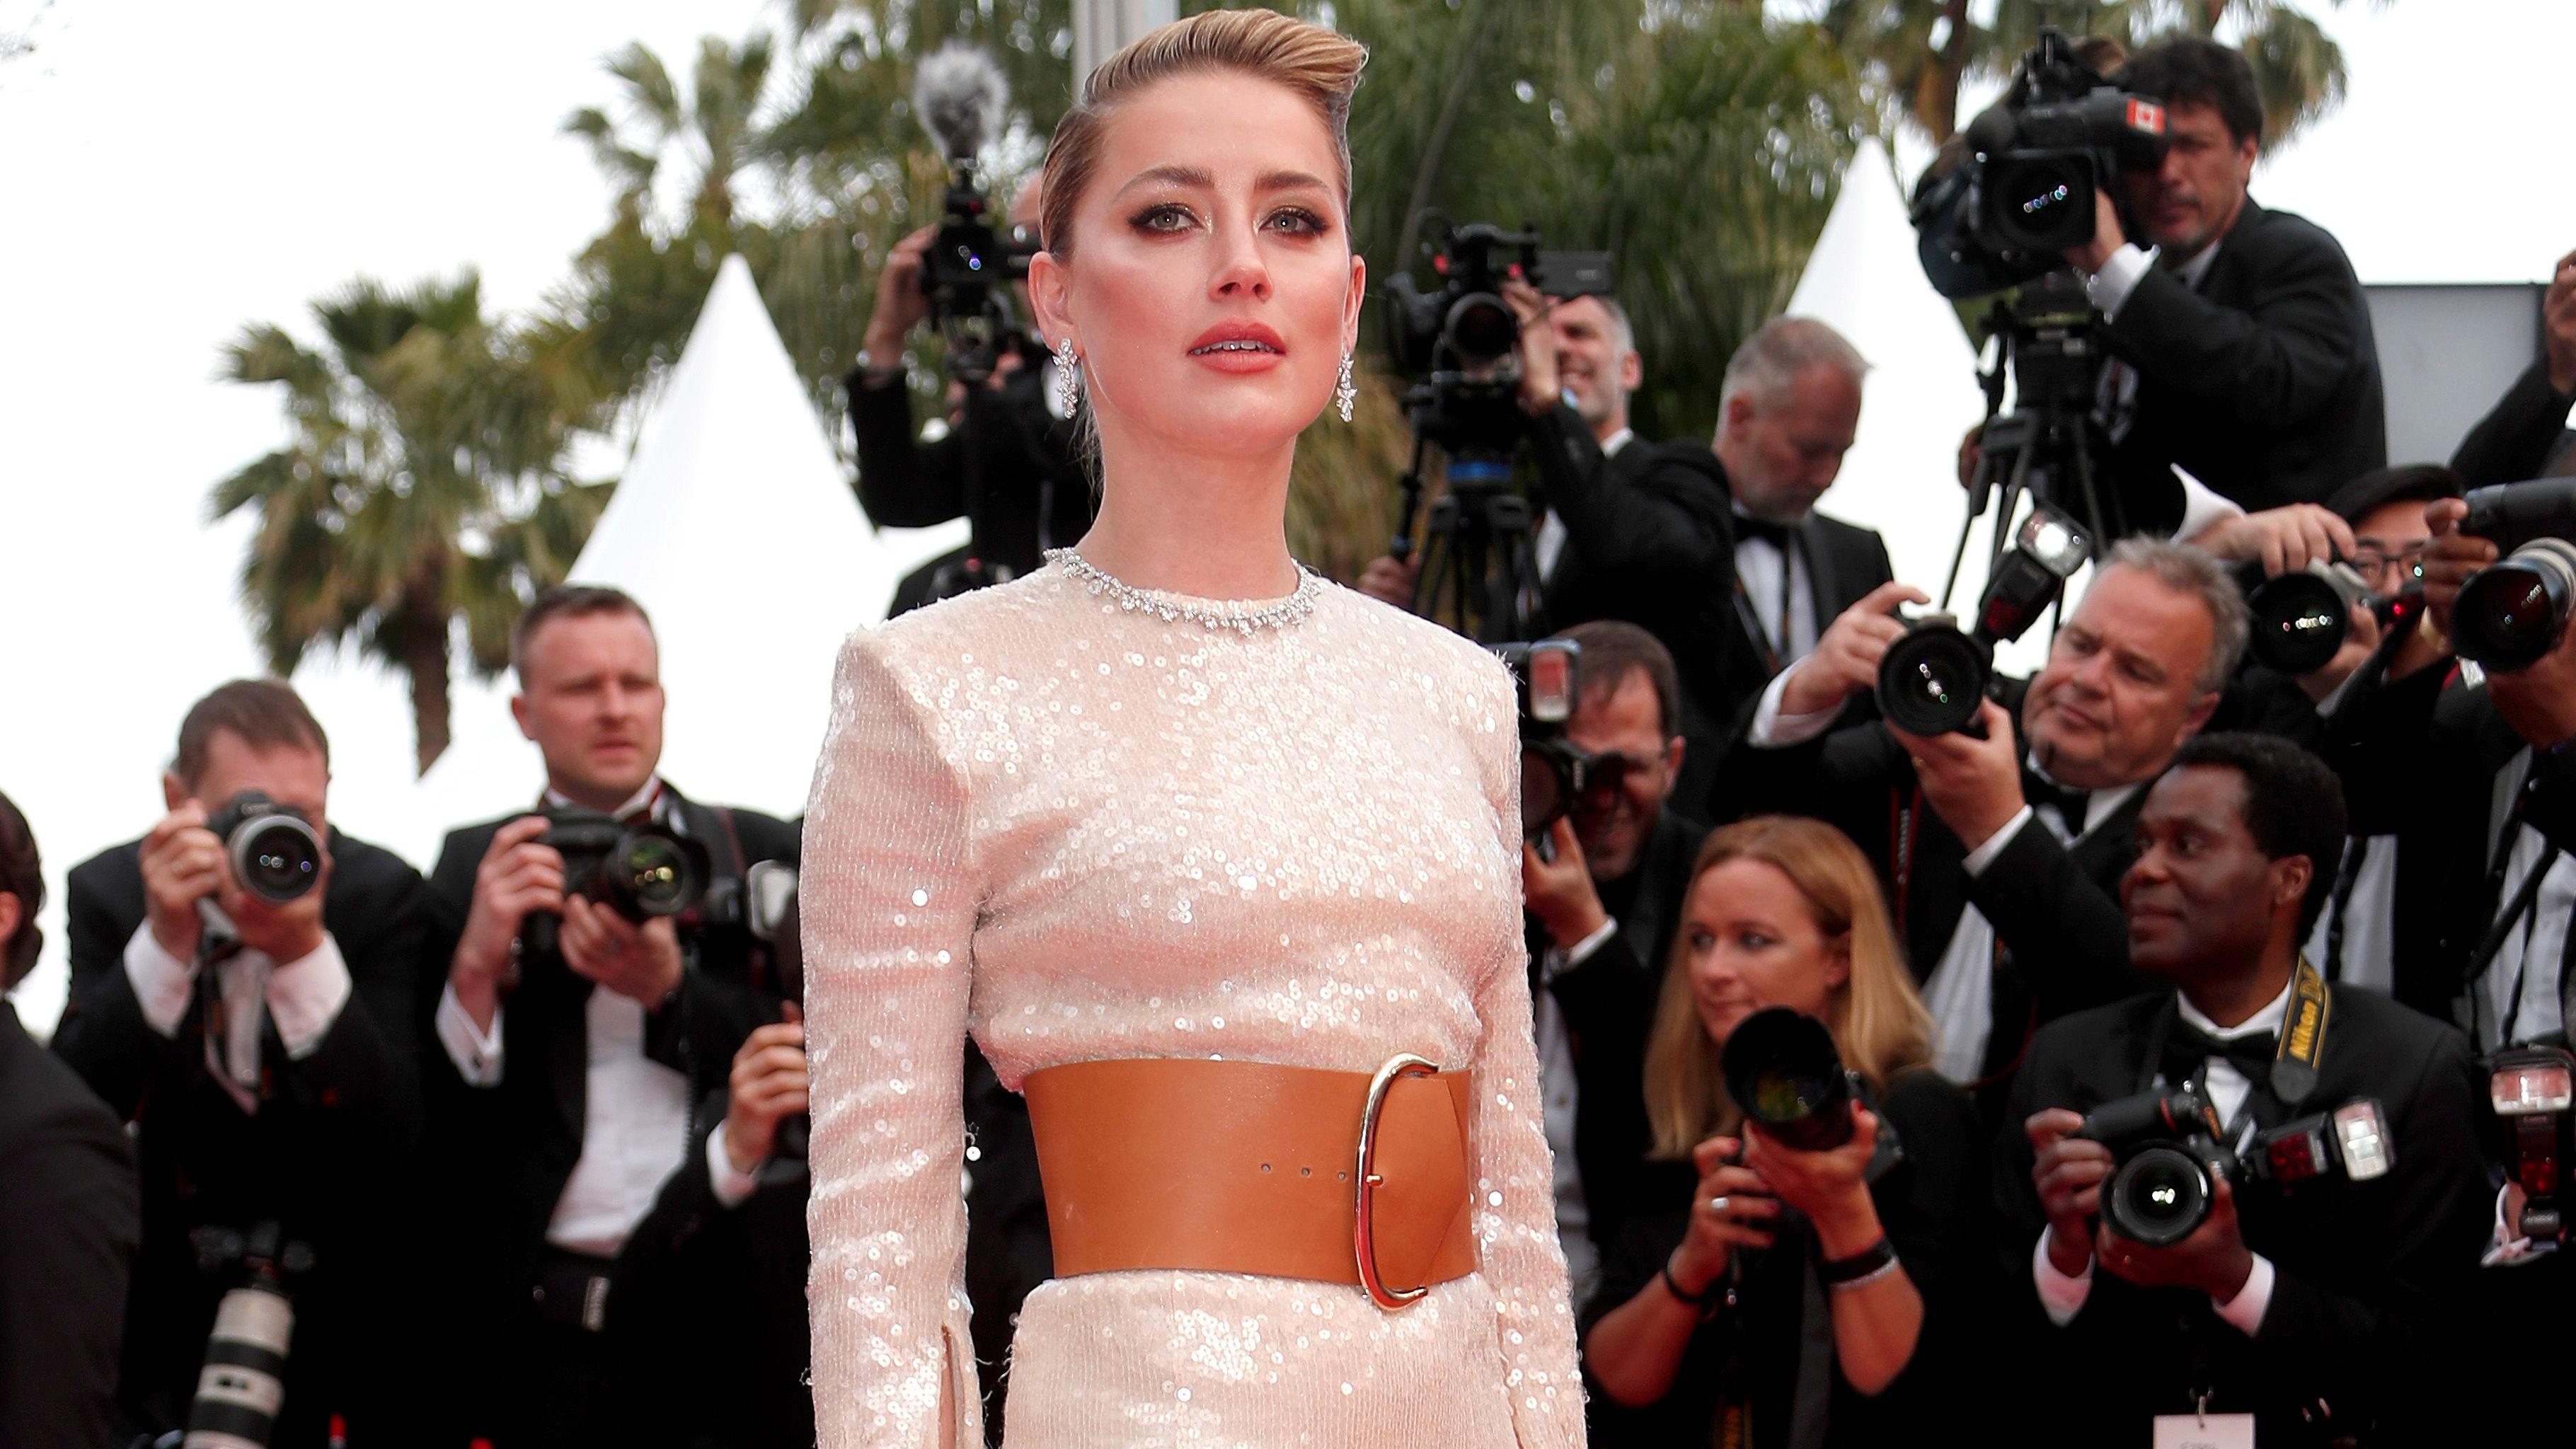 Amber Heard Celebrity In Cannes Film Festival 2019 - Amber Heard Cannes , HD Wallpaper & Backgrounds